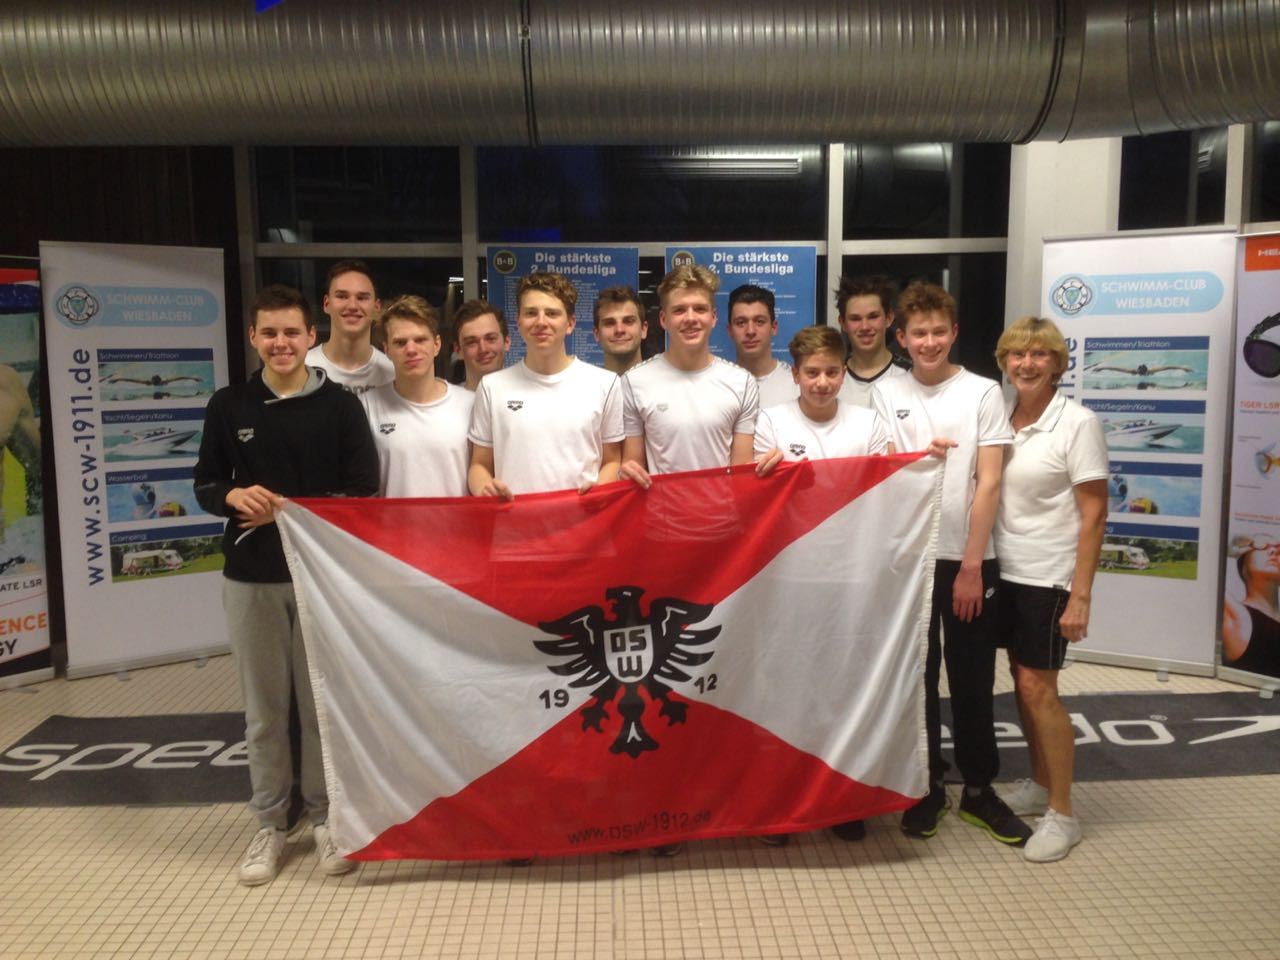 DSW 12 Darmstadt swimming team